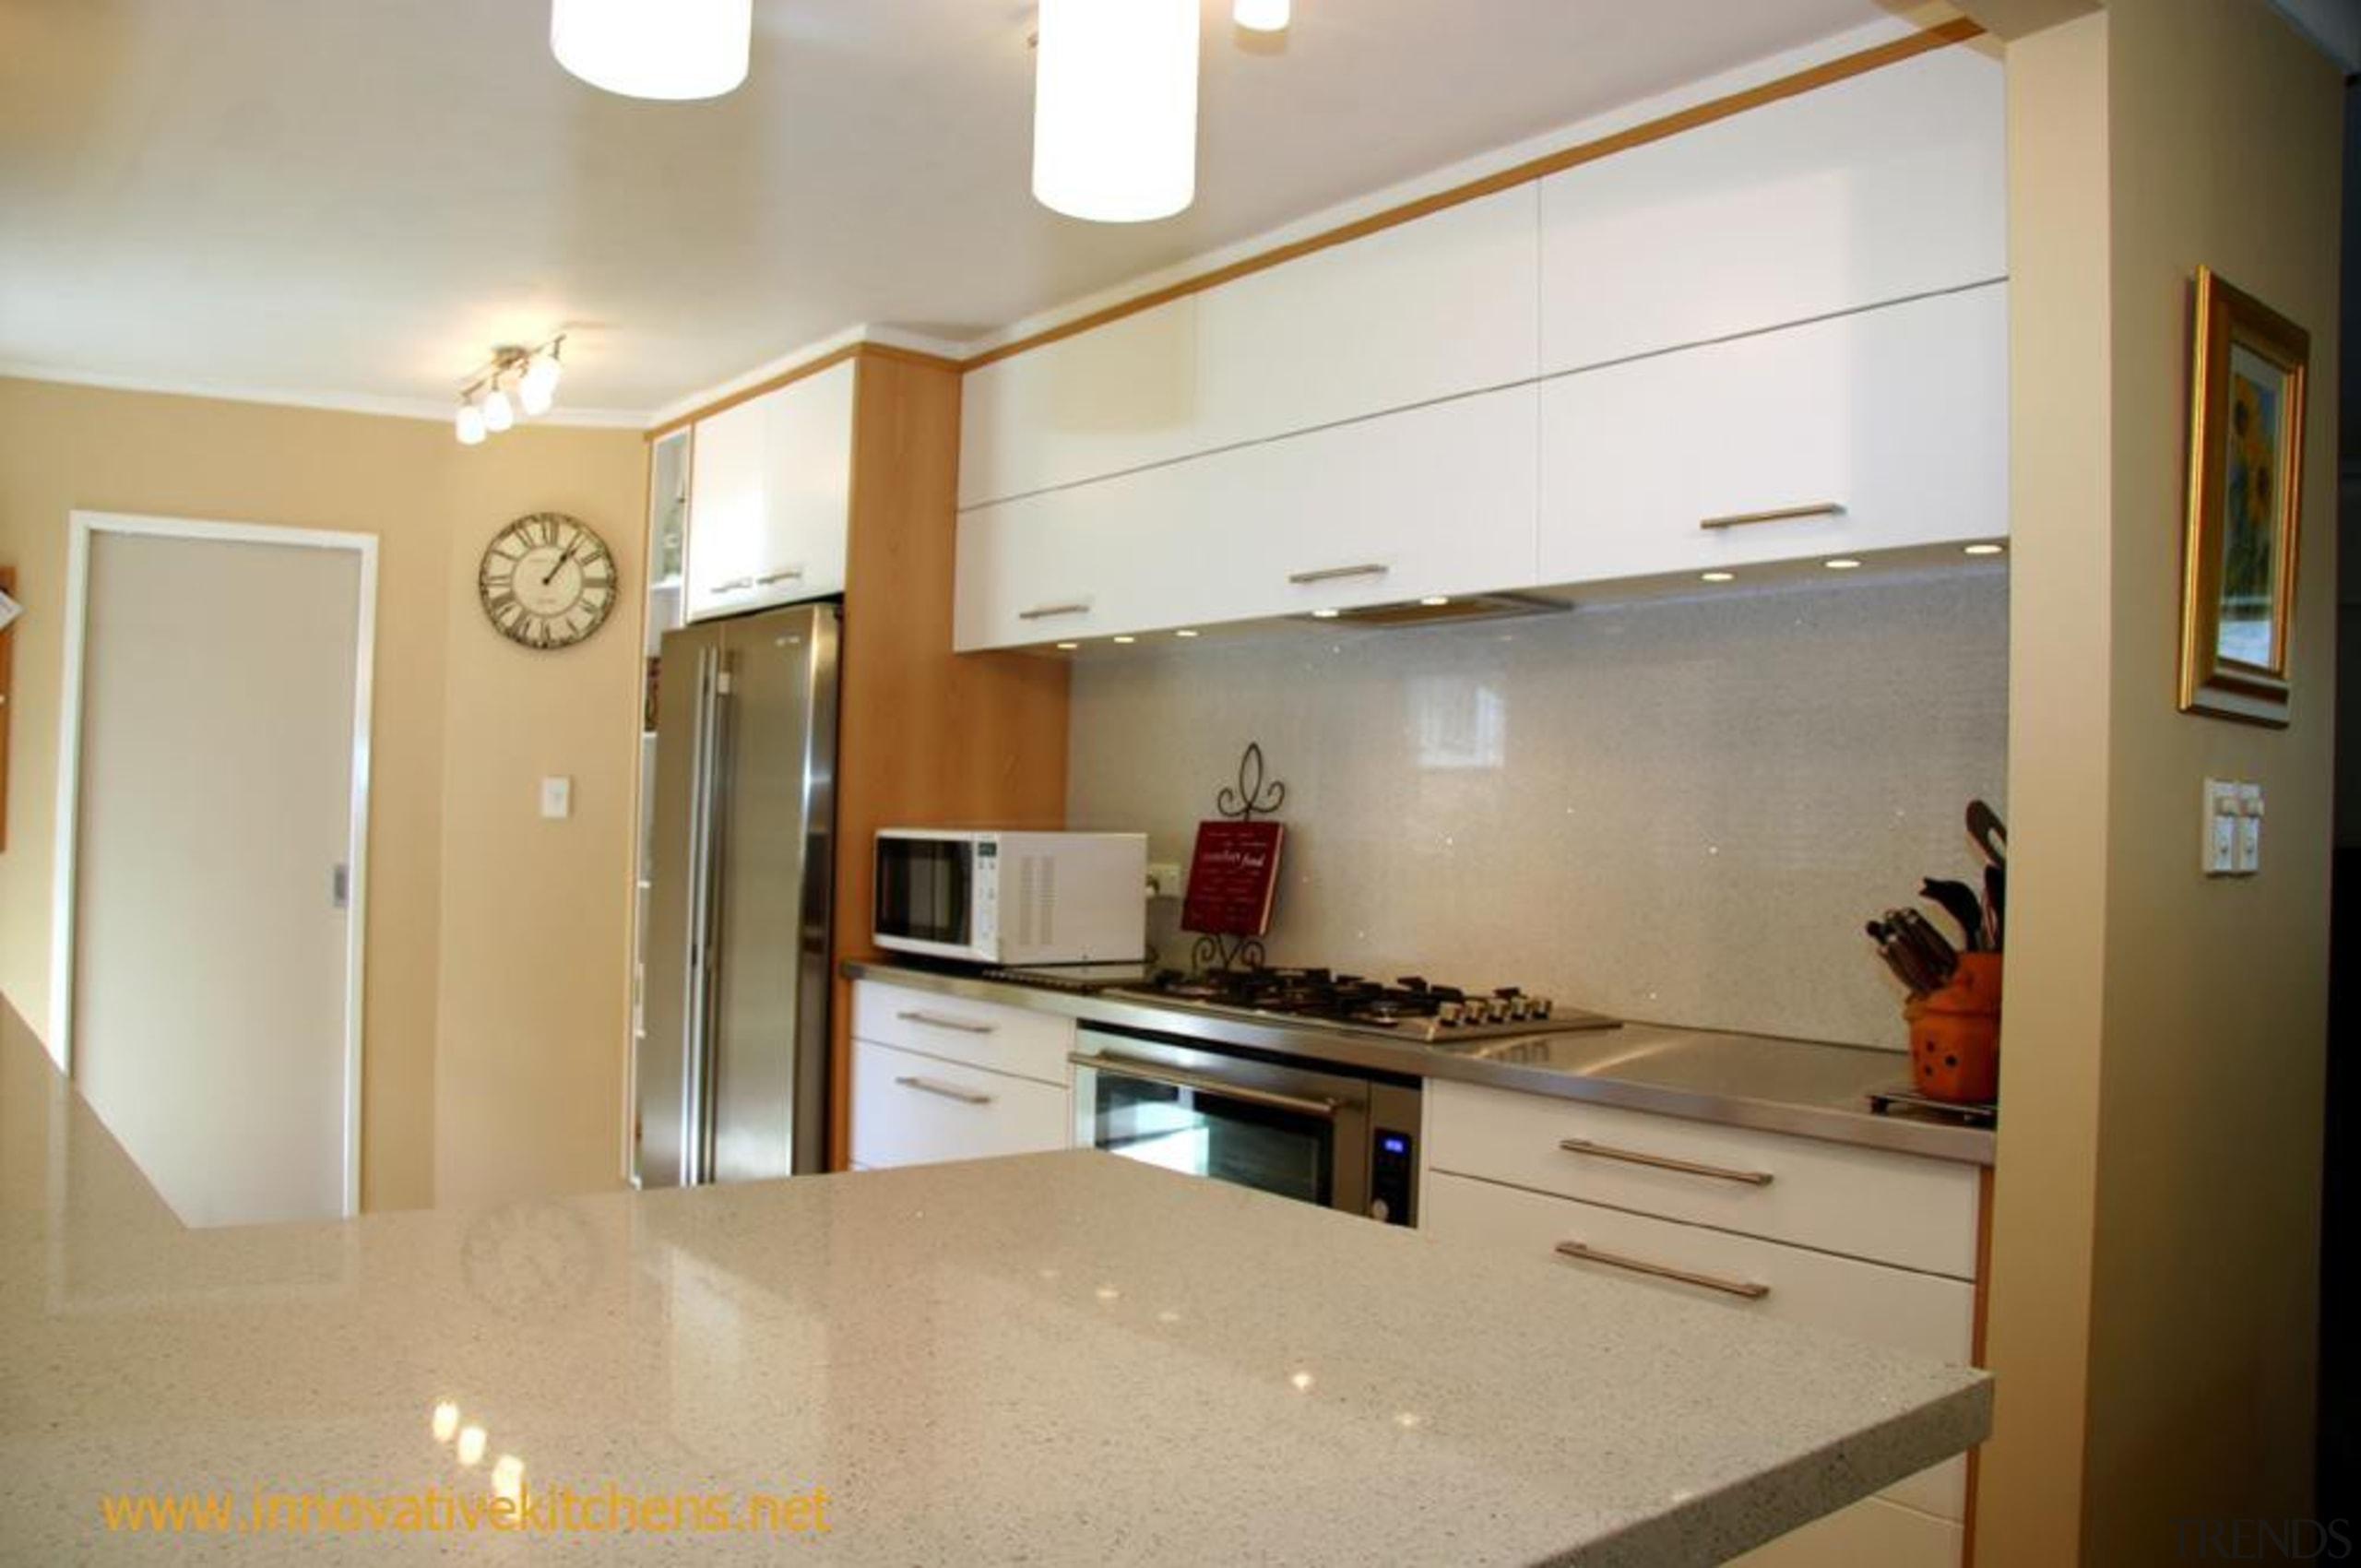 modernbirkenhead1.jpg - modernbirkenhead1.jpg - cabinetry | countertop | cabinetry, countertop, cuisine classique, floor, interior design, kitchen, property, real estate, room, gray, brown